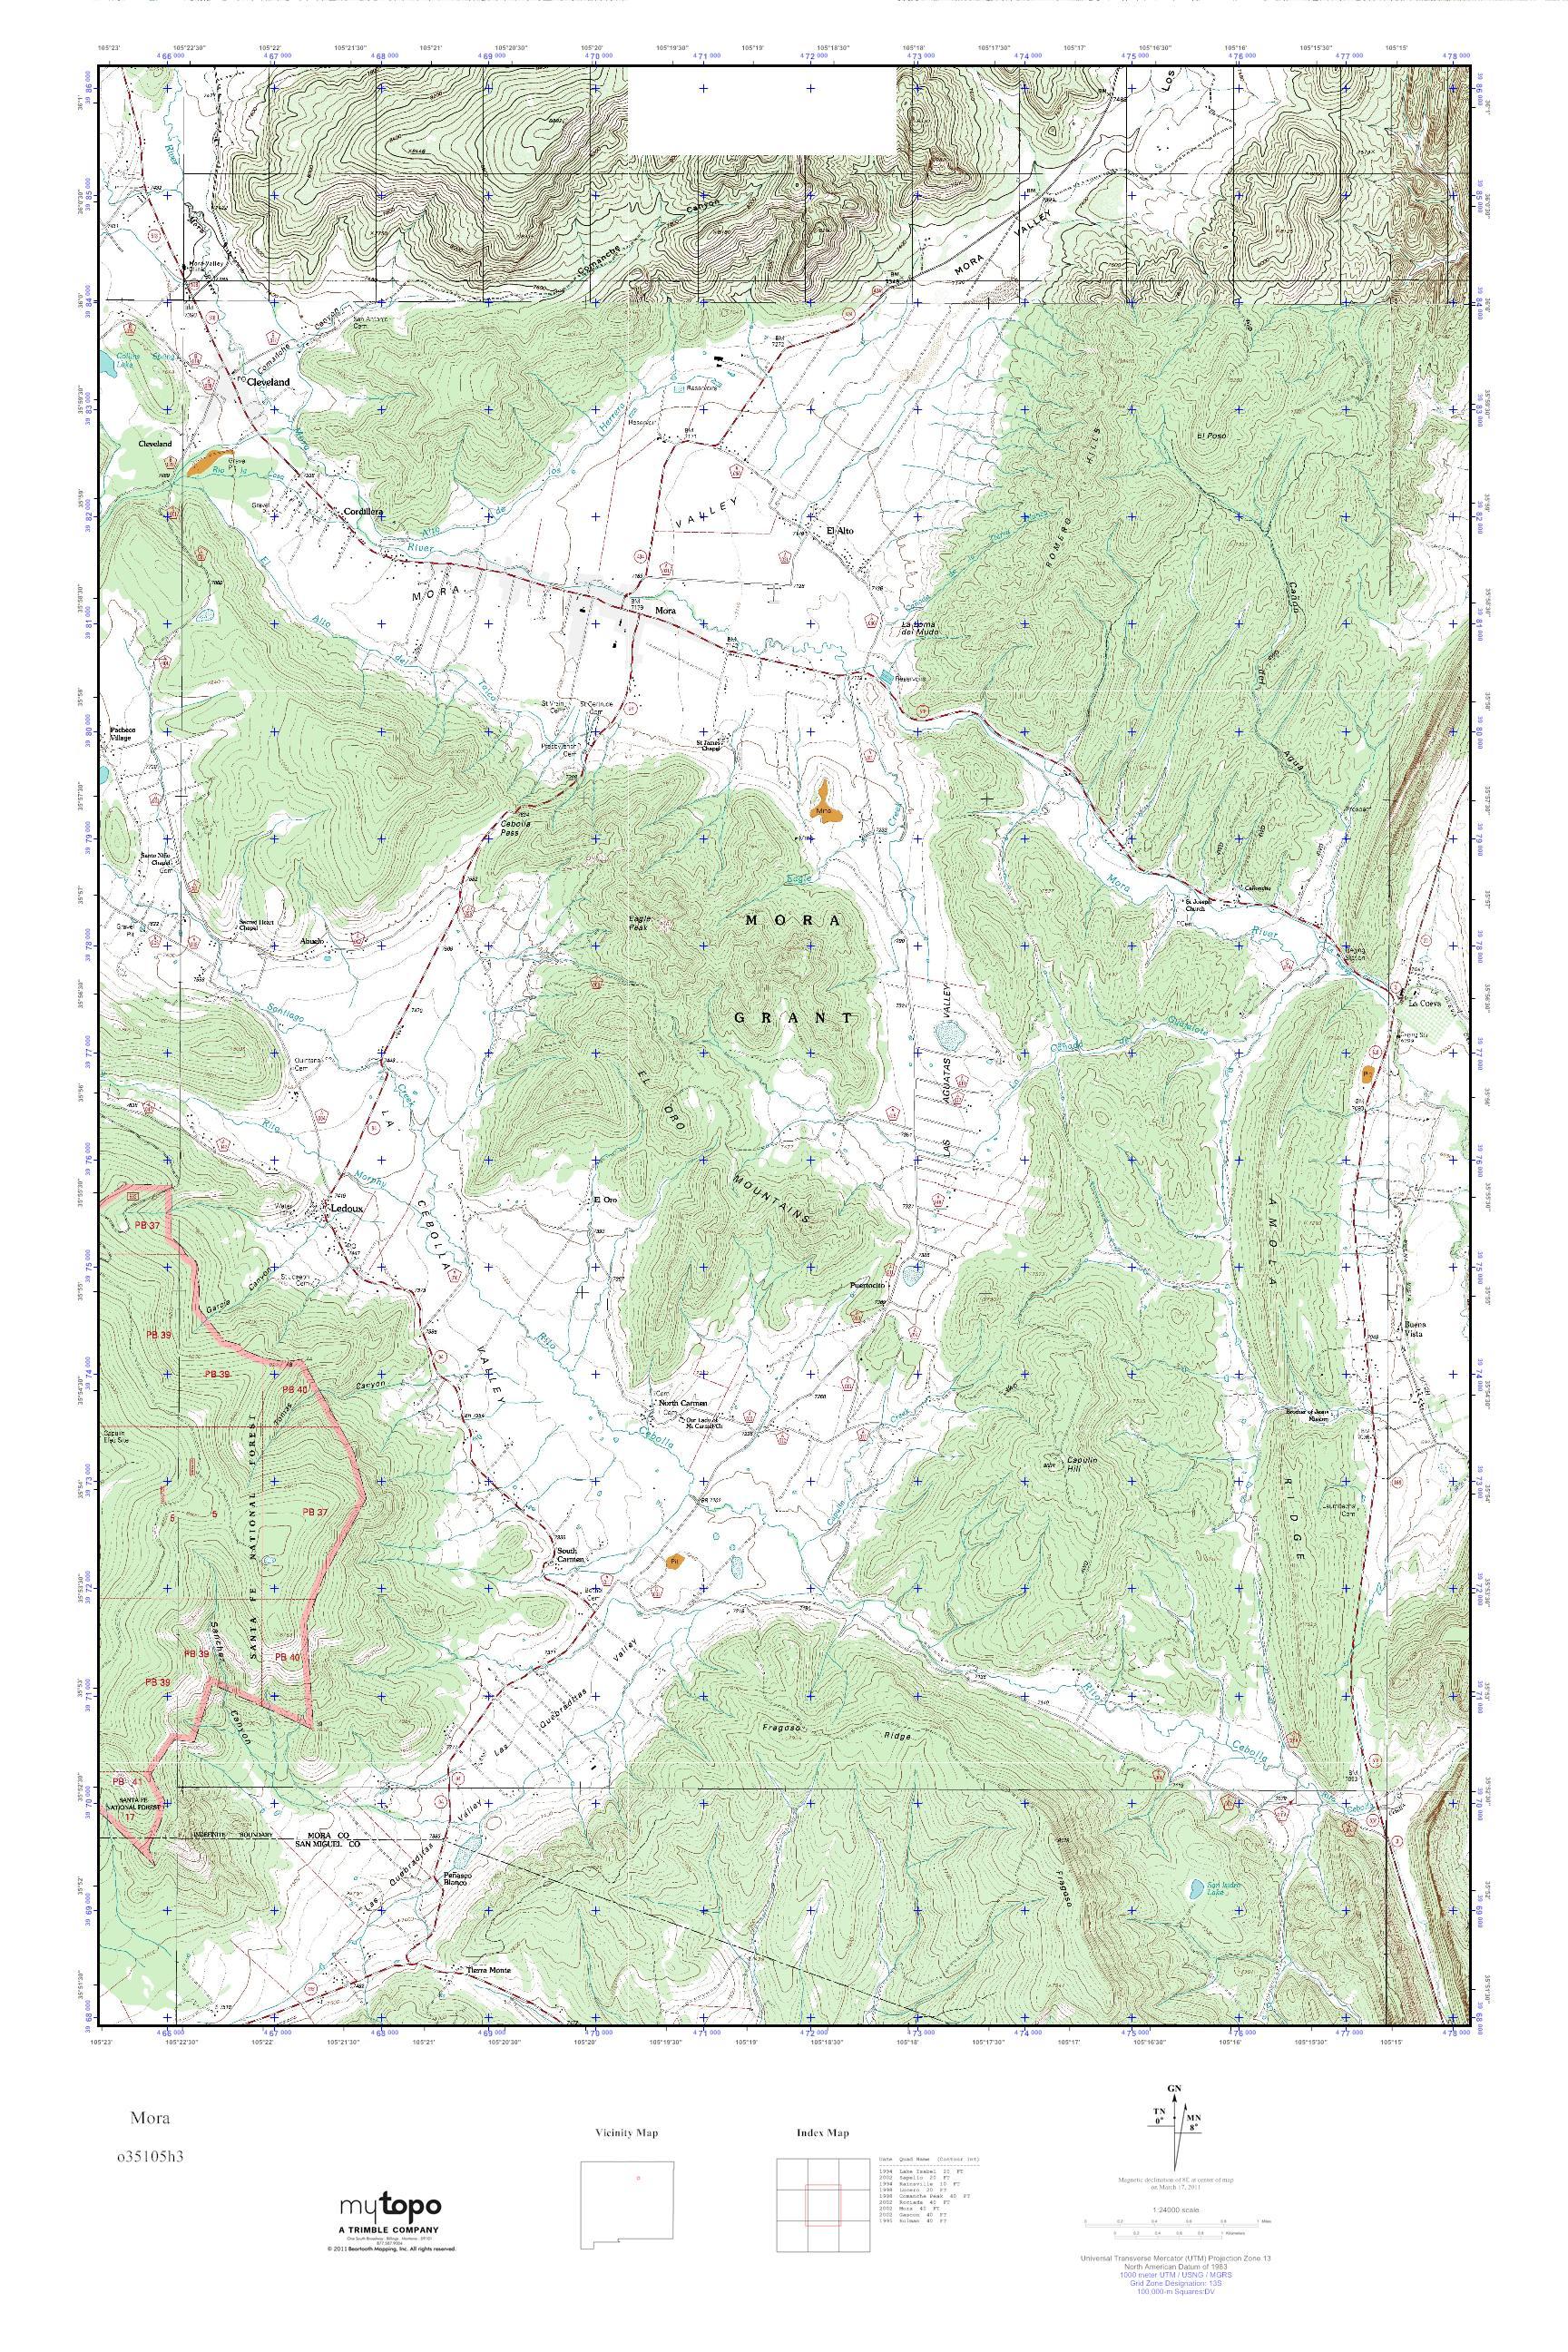 Mytopo Mora New Mexico Usgs Quad Topo Map